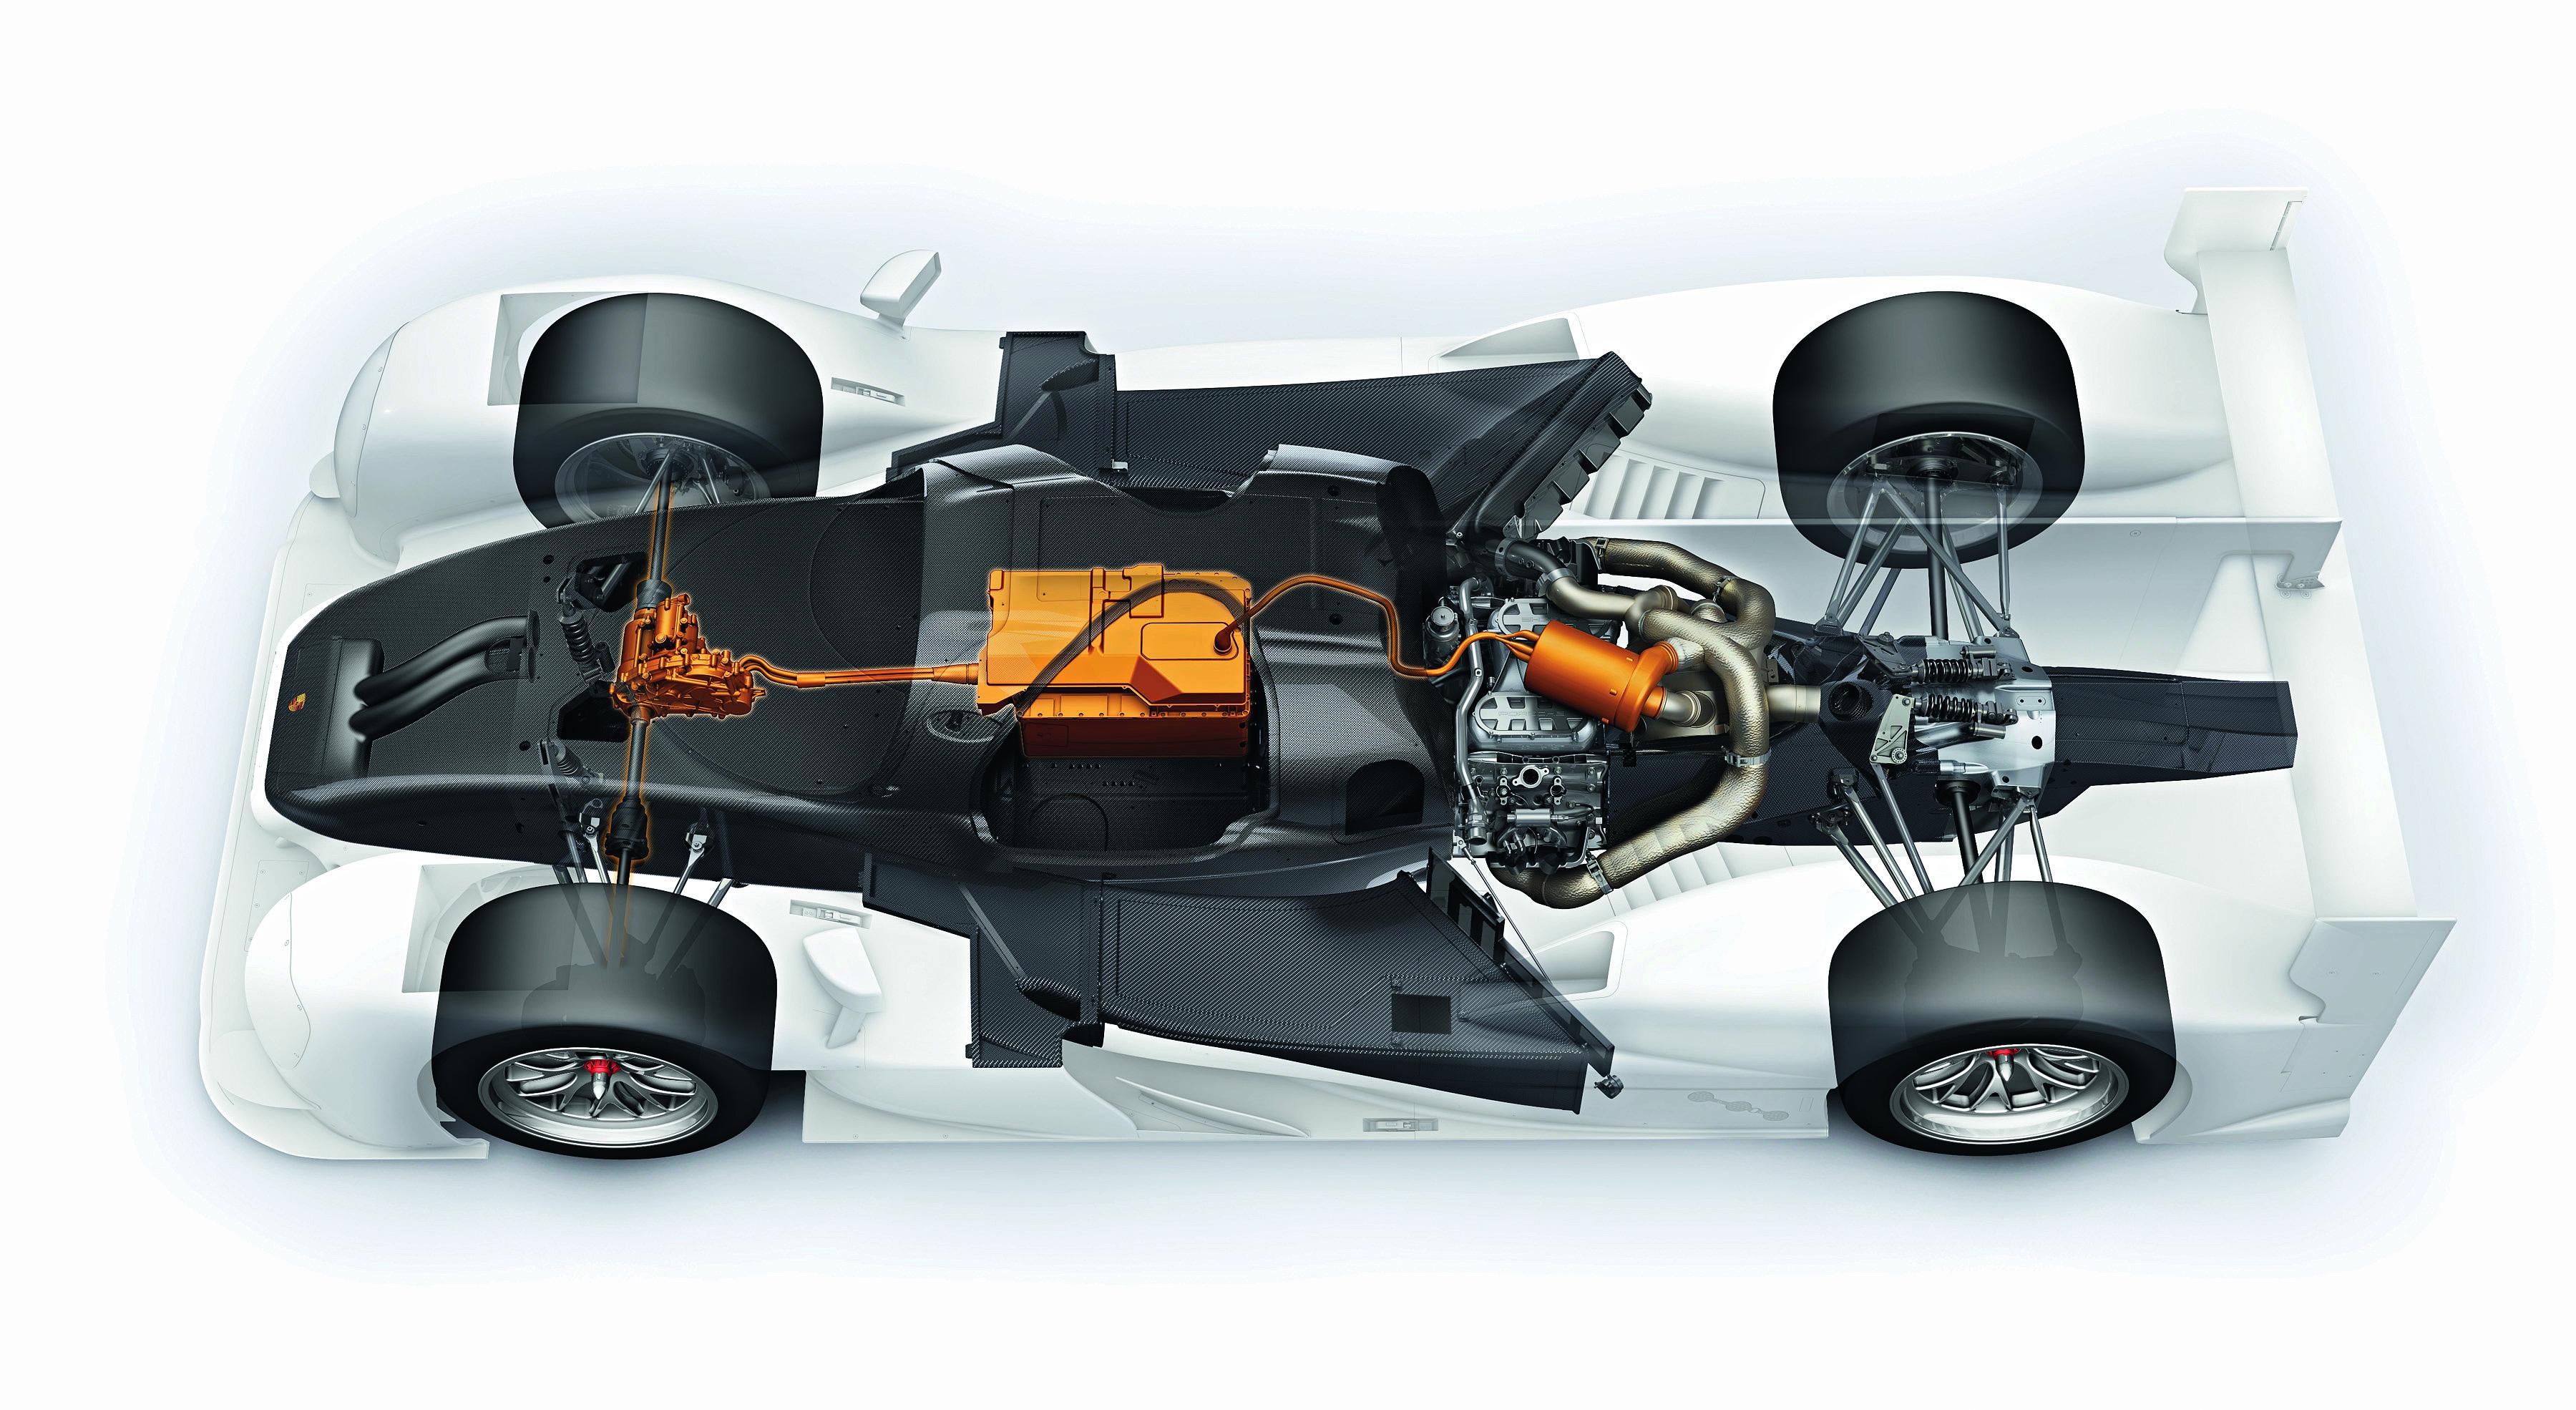 WEC: Petrol 2 liter V4 turbo hybrid (Porsche) Petrol 2.4 liter V6 turbo hybrid (Toyota) Diesel 4 liter V6 turbo hybrid (Audi) System power: 1,000 HP Top speed: 340 km/h, 0–100: 2.2 secs